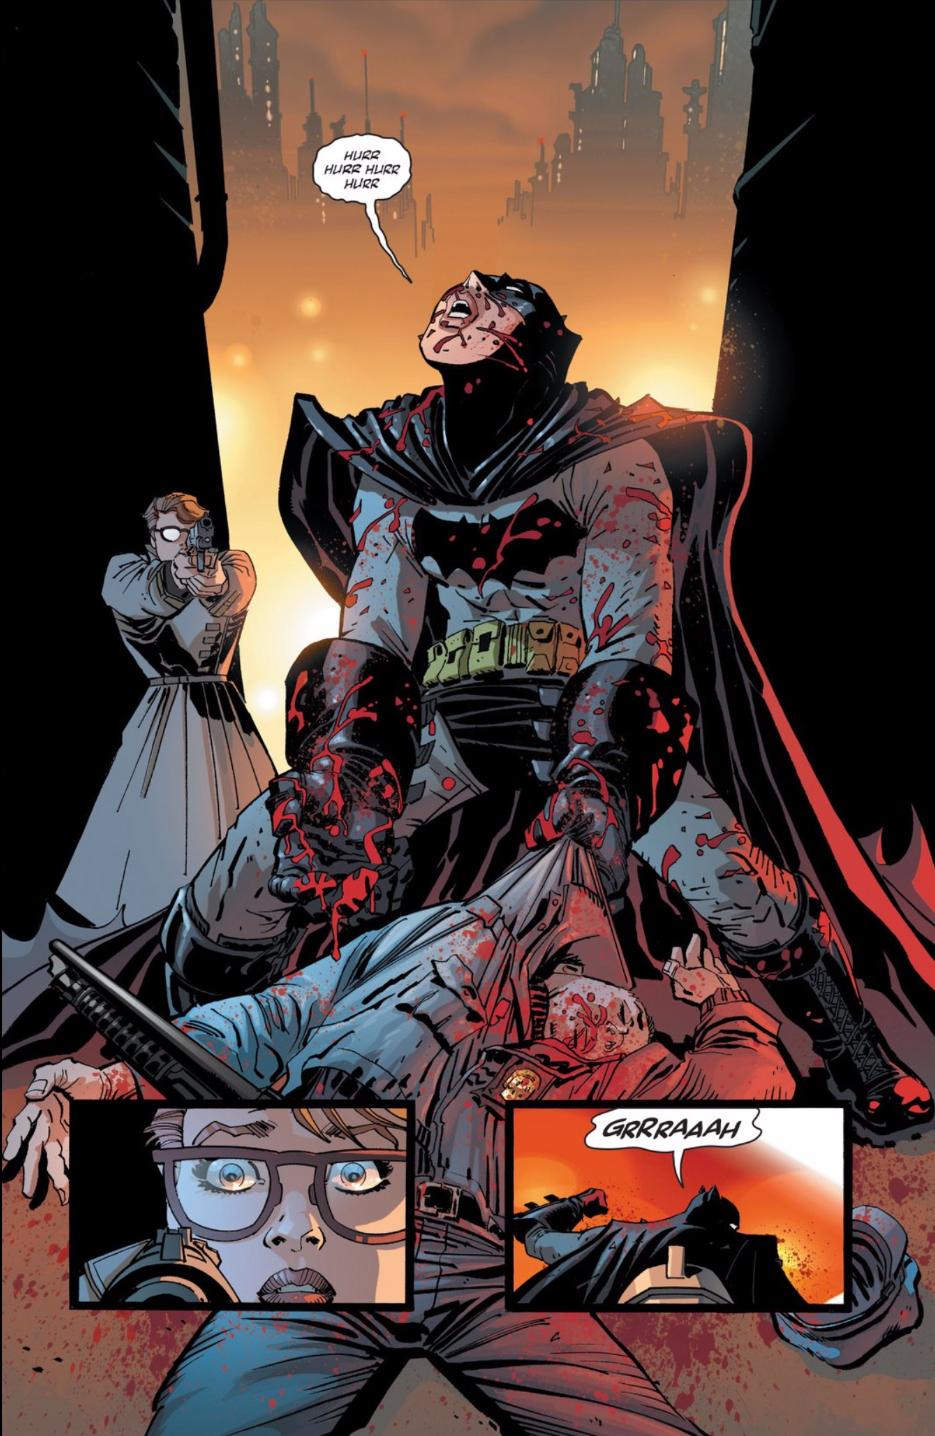 The New Dark Knight Series Isn't Really a Batman Comic Anymore